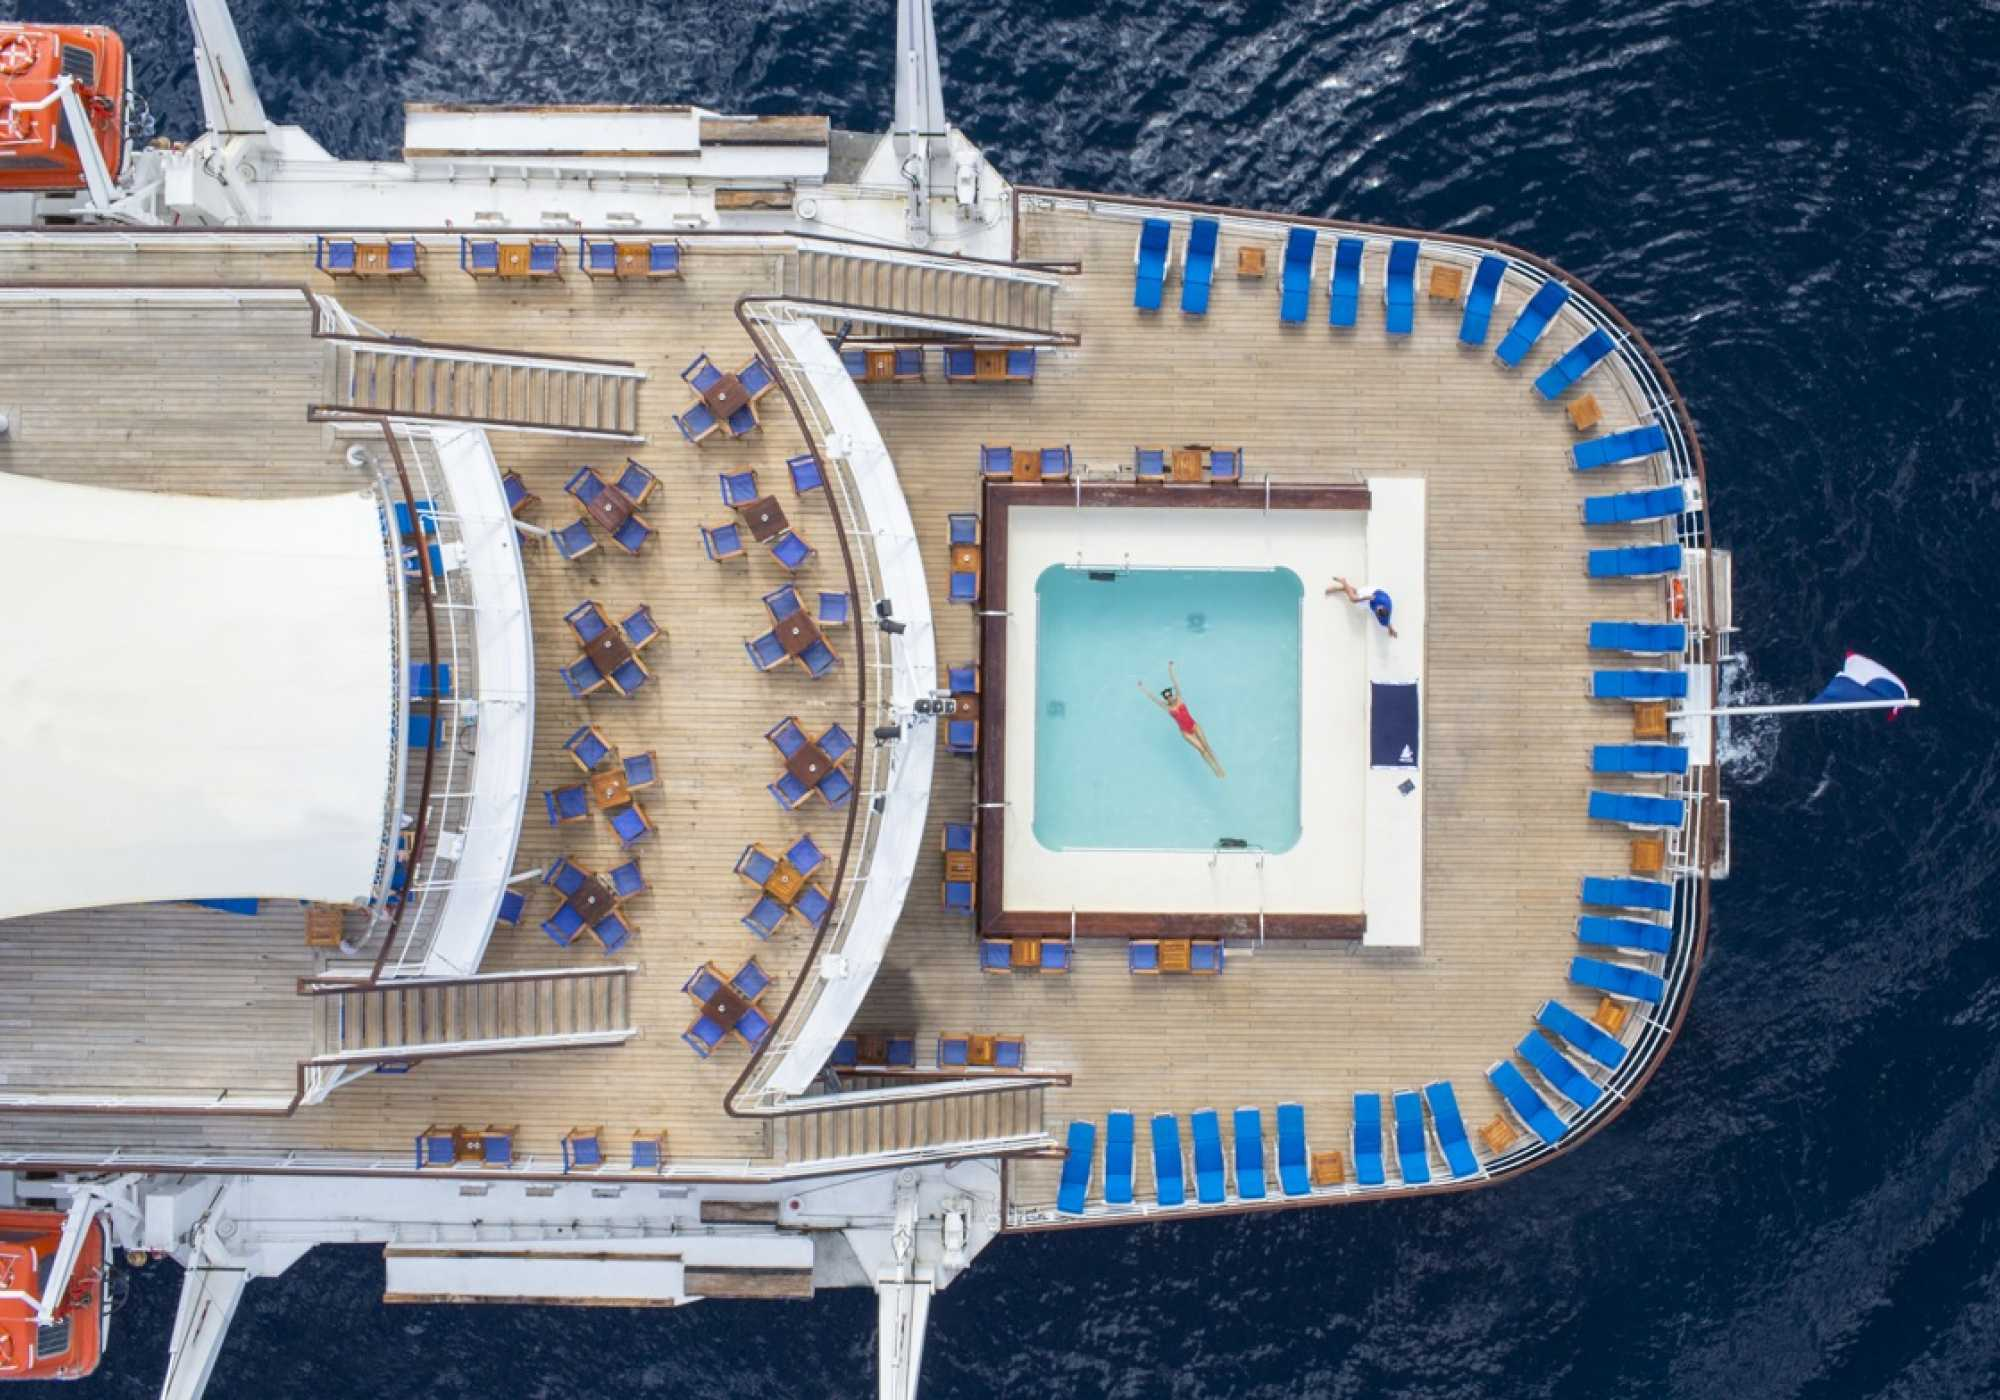 Club Med 2 Yacht